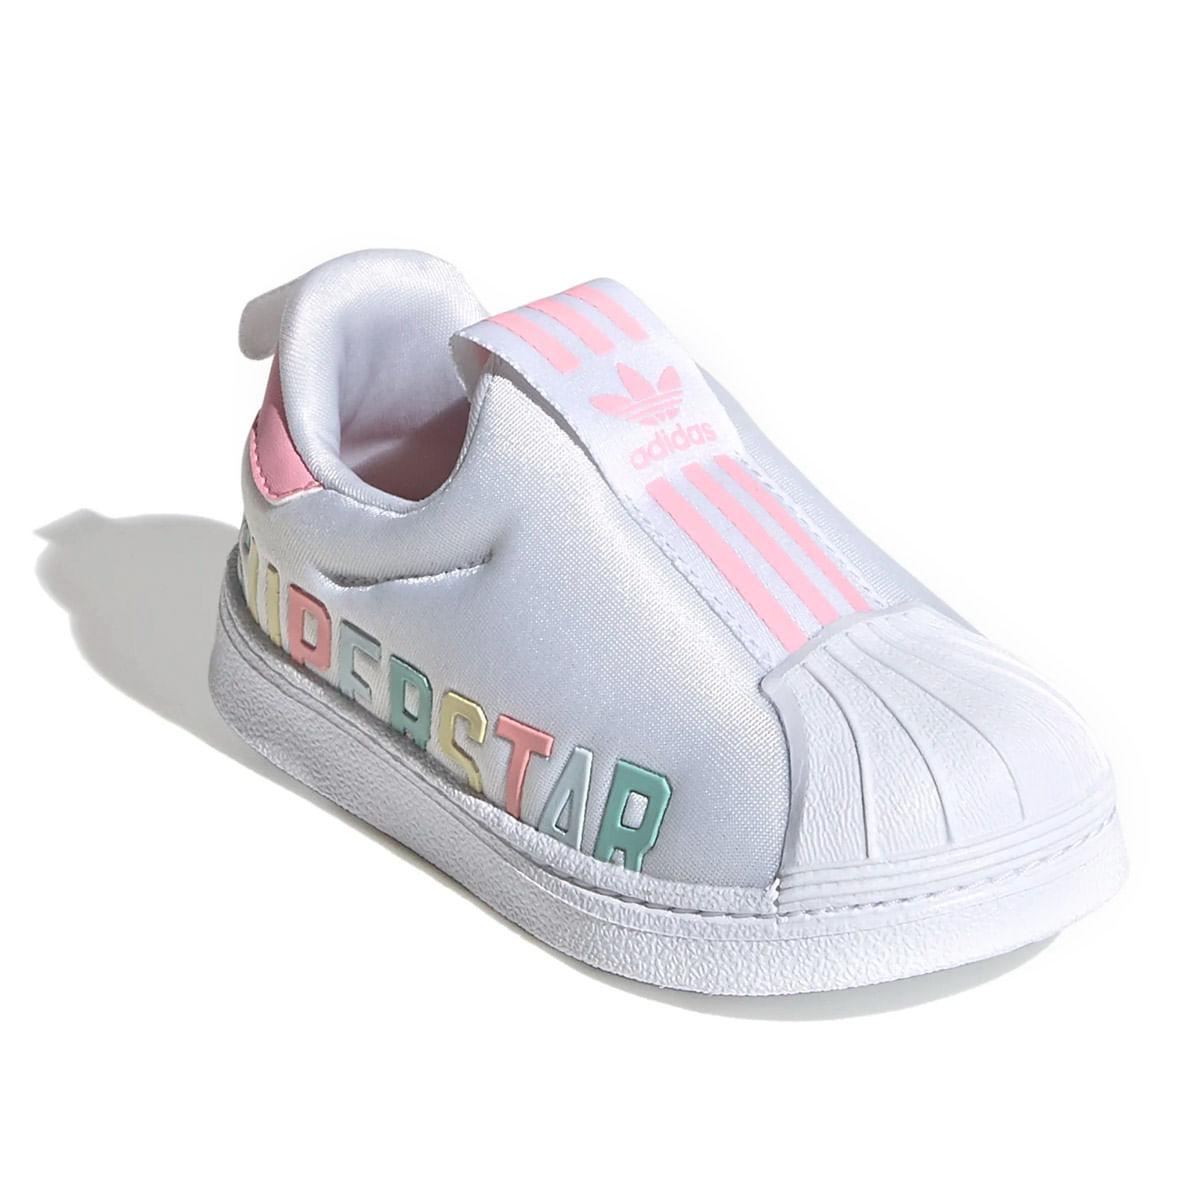 Tenis-Infantil-Menina-Adidas-Superstar-360-X-I--18-ao-25---PRE-VENDA-